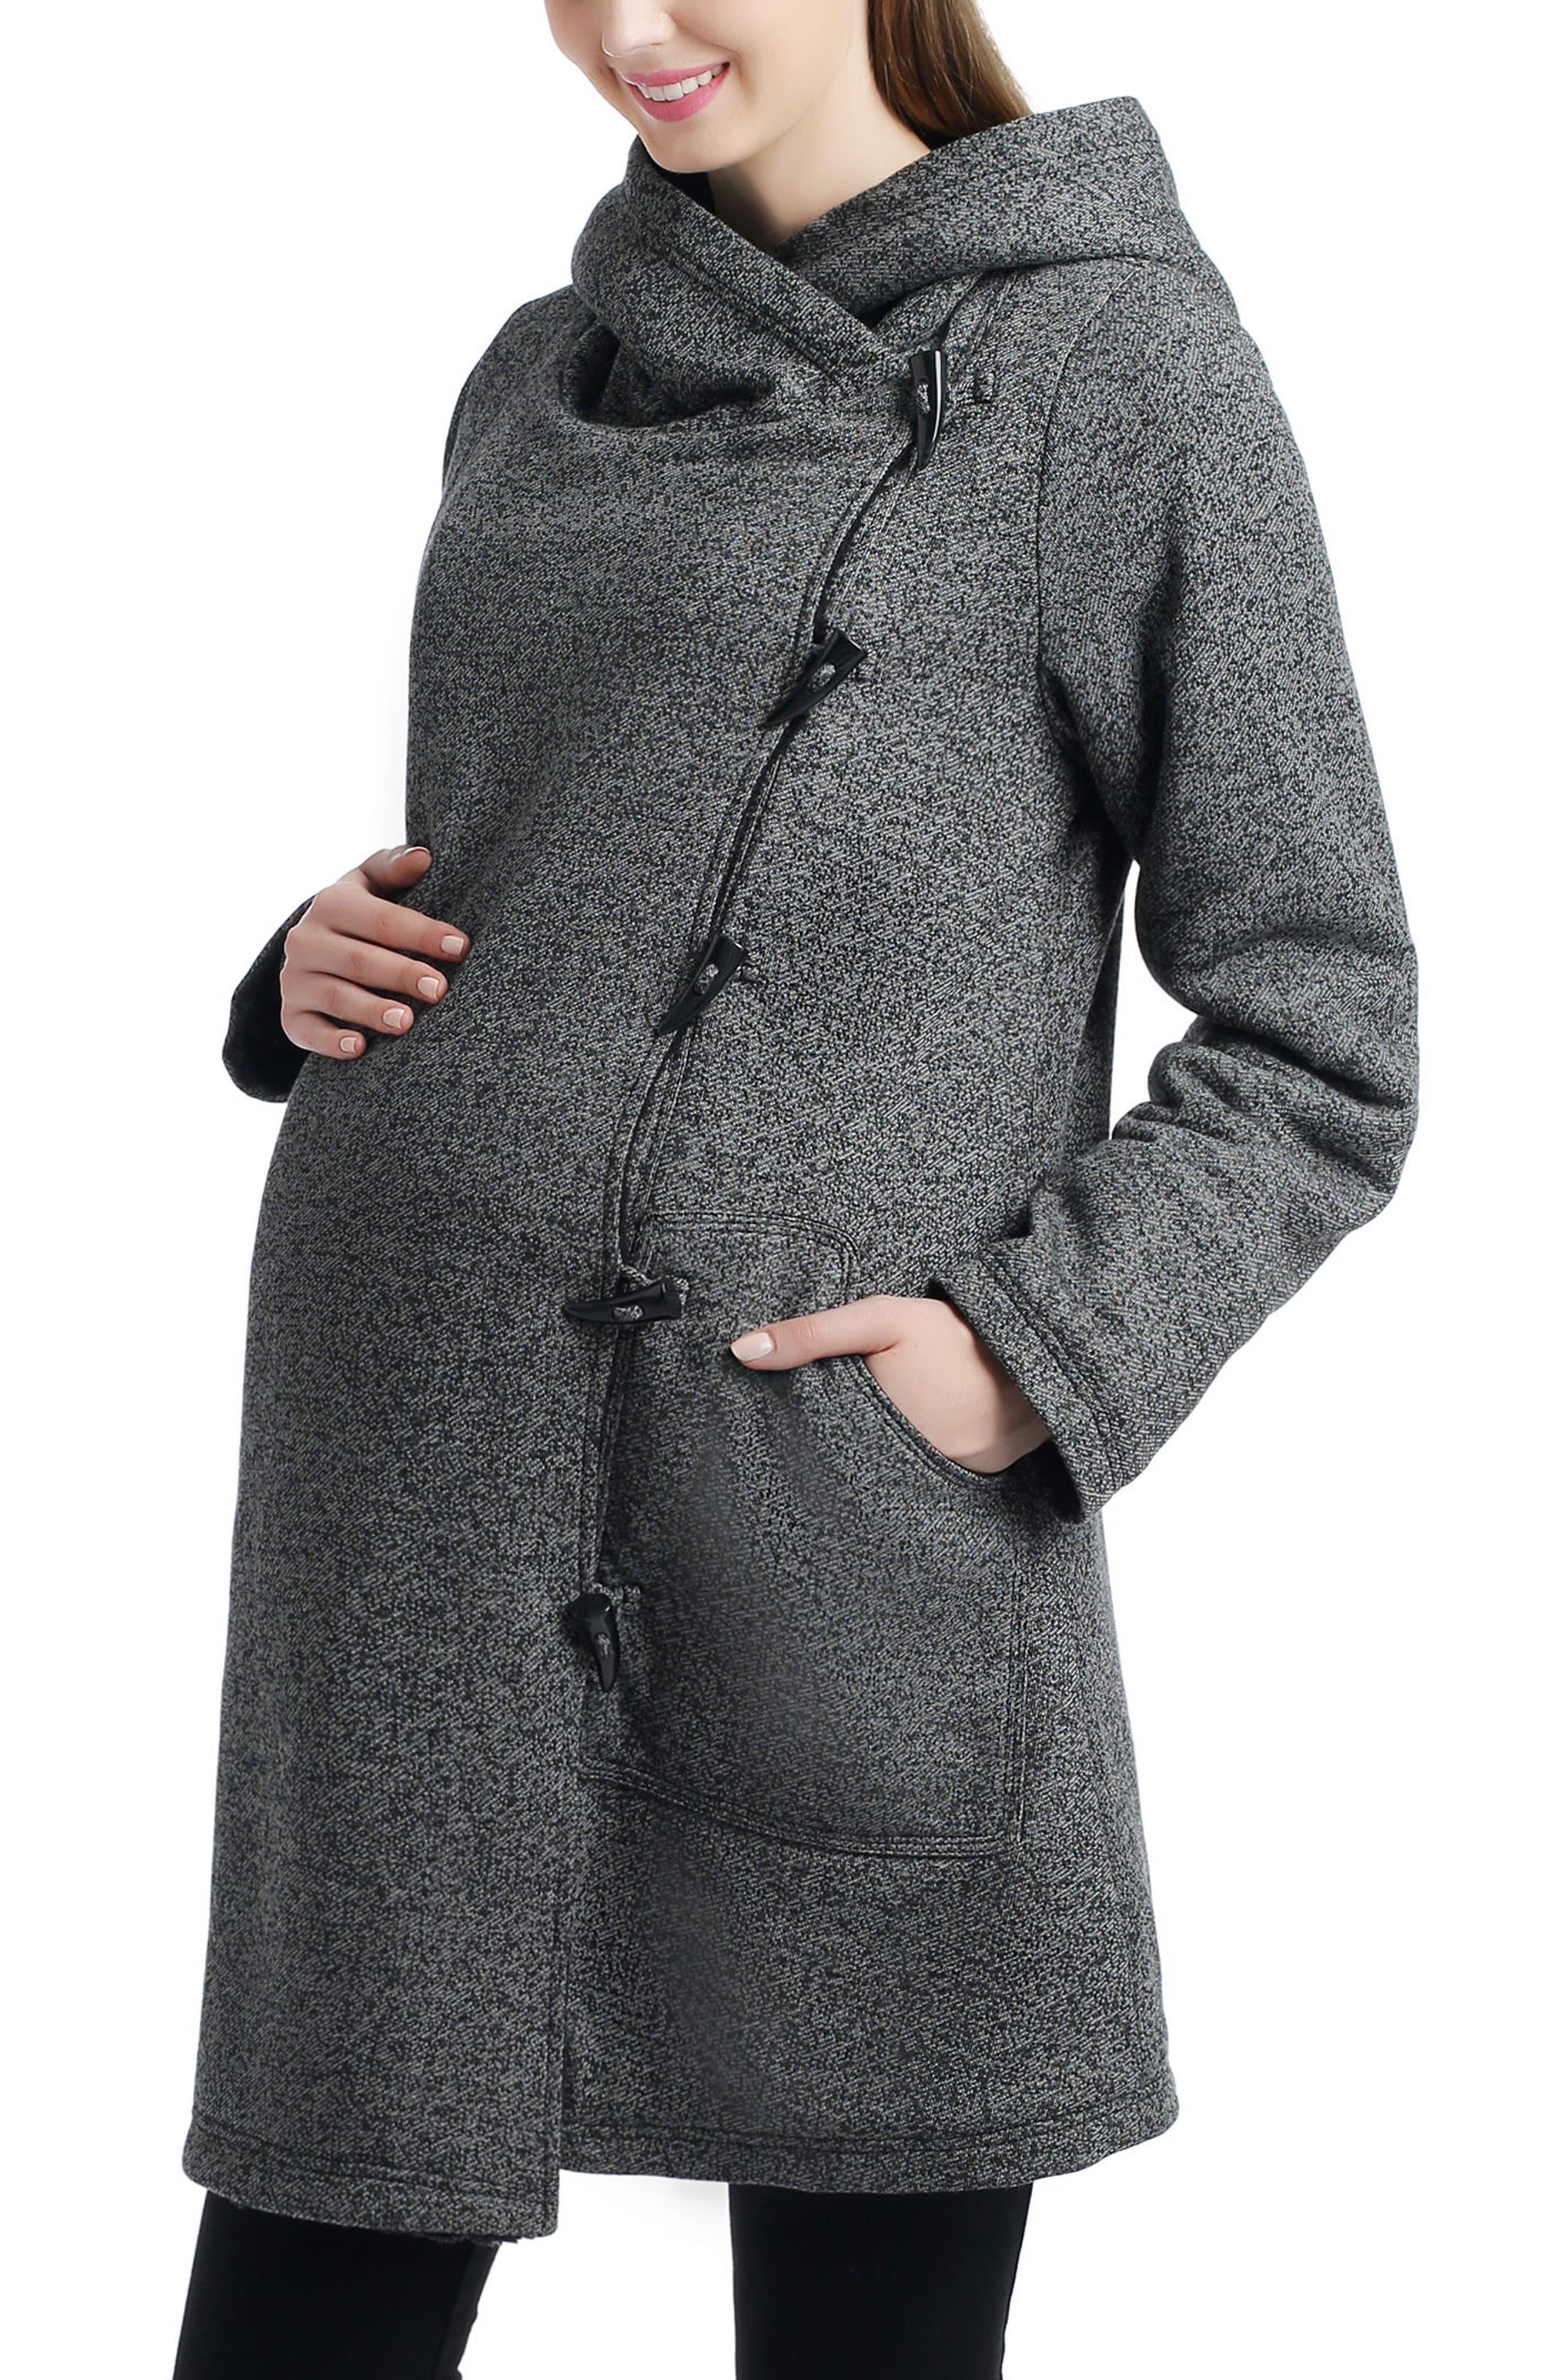 Main Image - Kimi and Kai Amy Hooded Maternity Sweatshirt Jacket